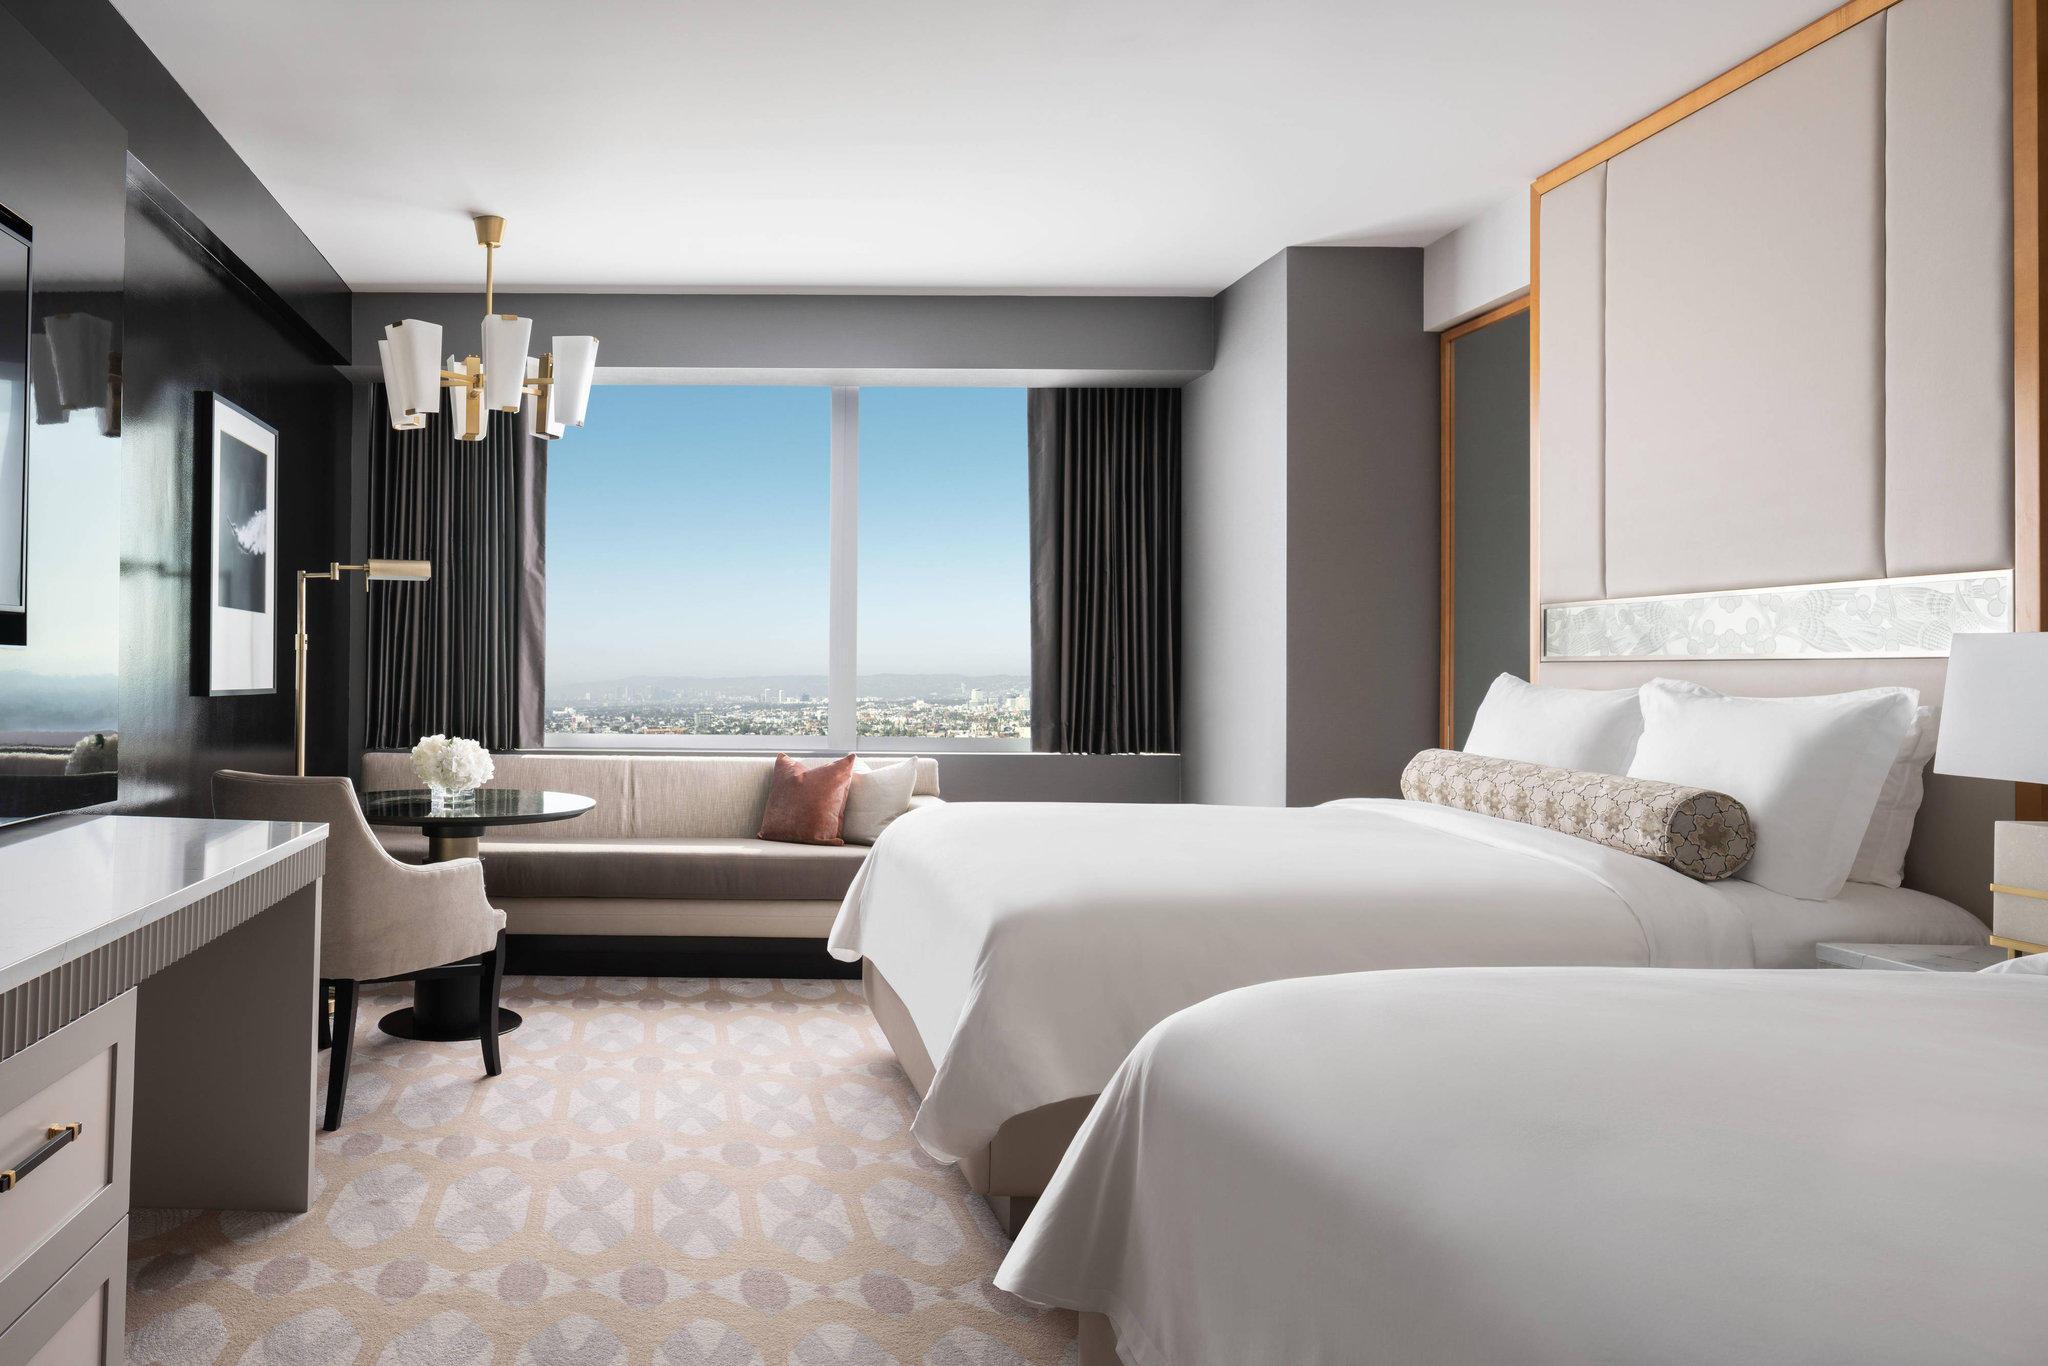 The Ritz-Carlton, Los Angeles